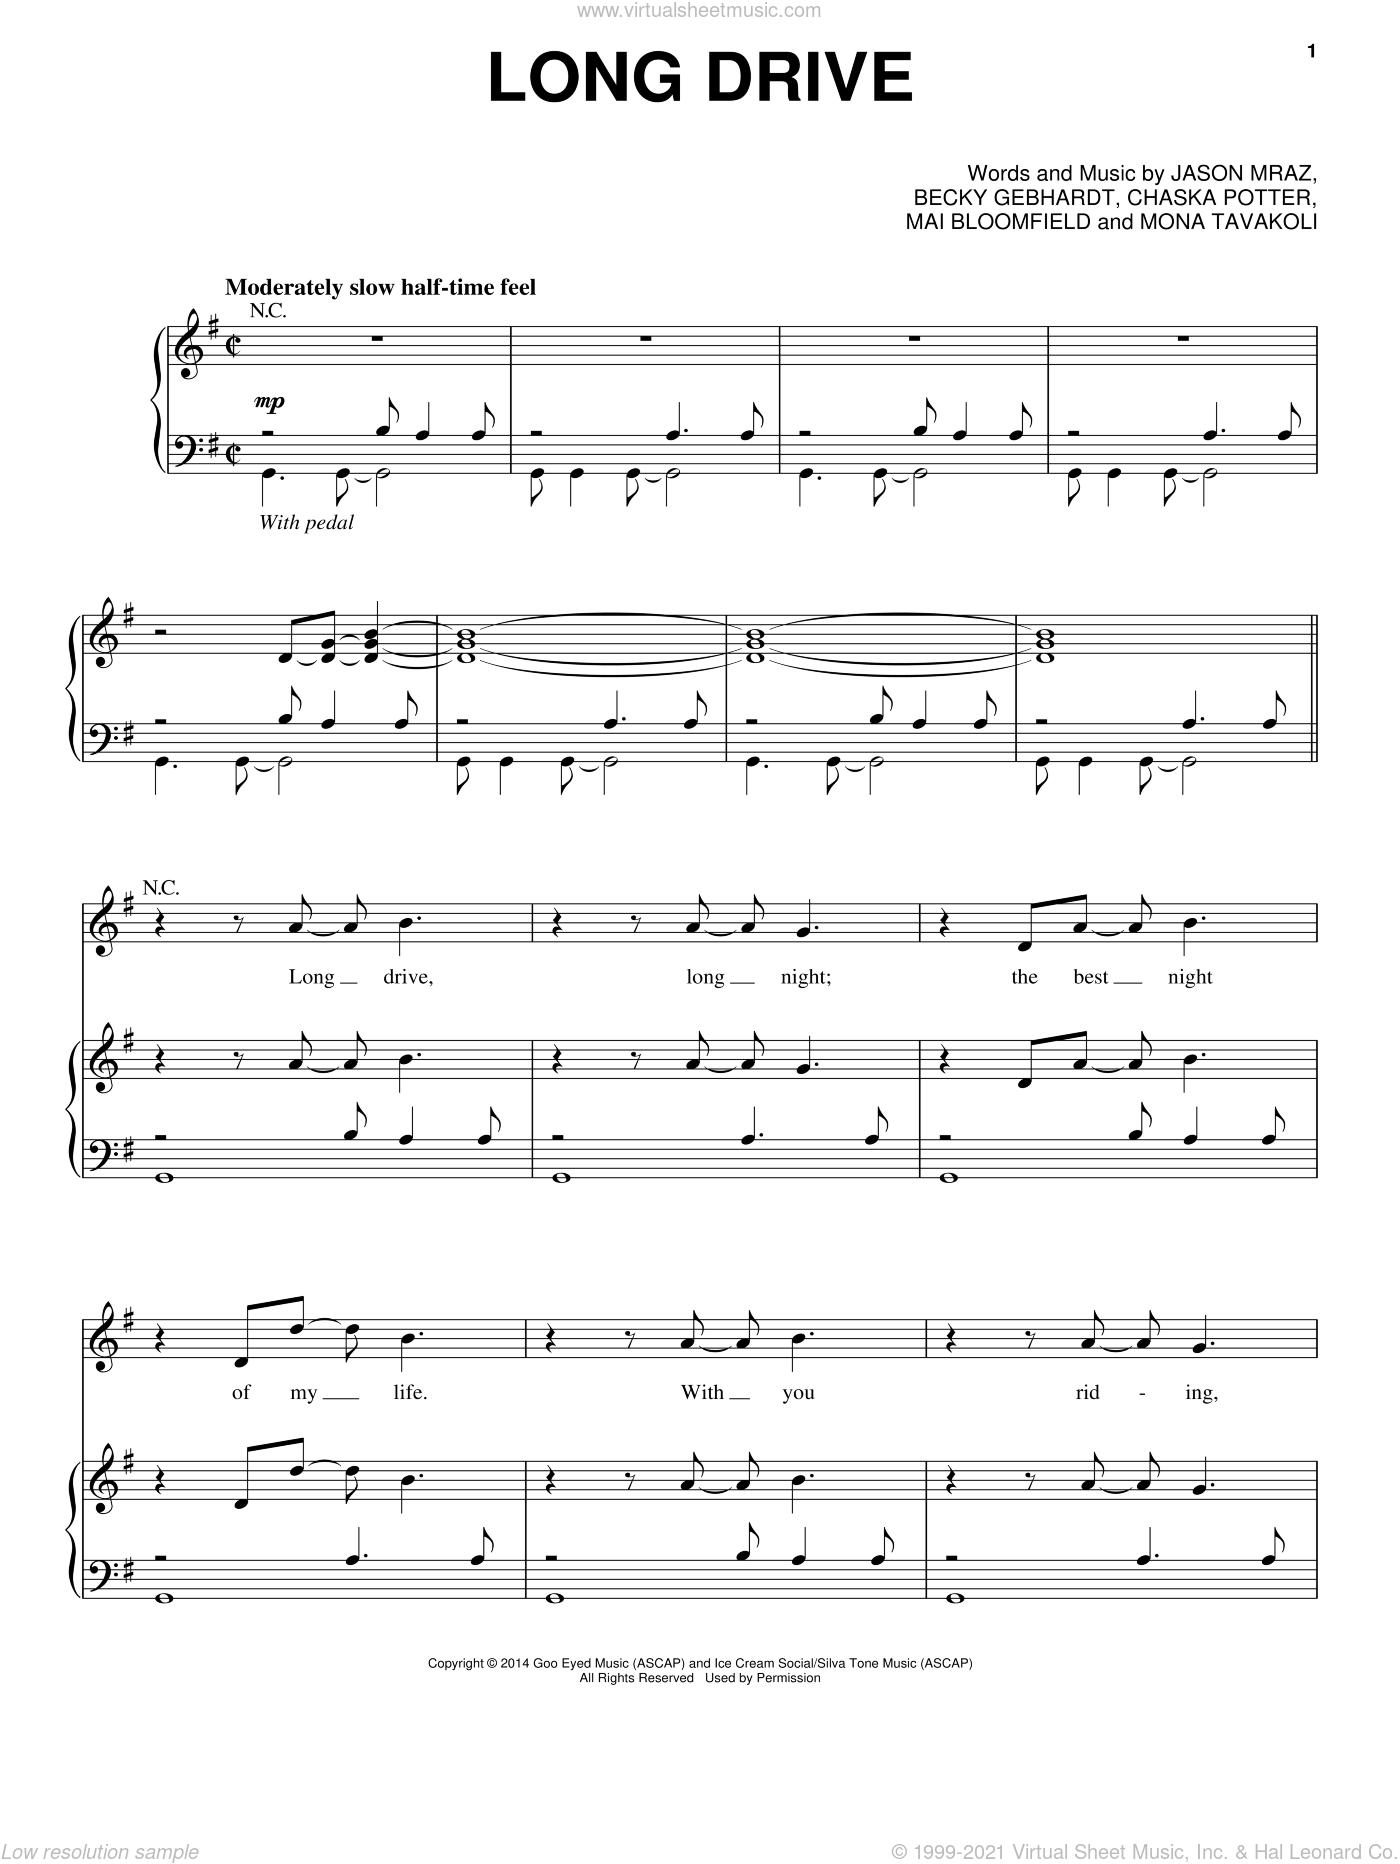 Long Drive sheet music for voice, piano or guitar by Jason Mraz, Becky Gebhardt, Chaska Potter, Mai Bloomfield and Mona Tavakoli, intermediate skill level